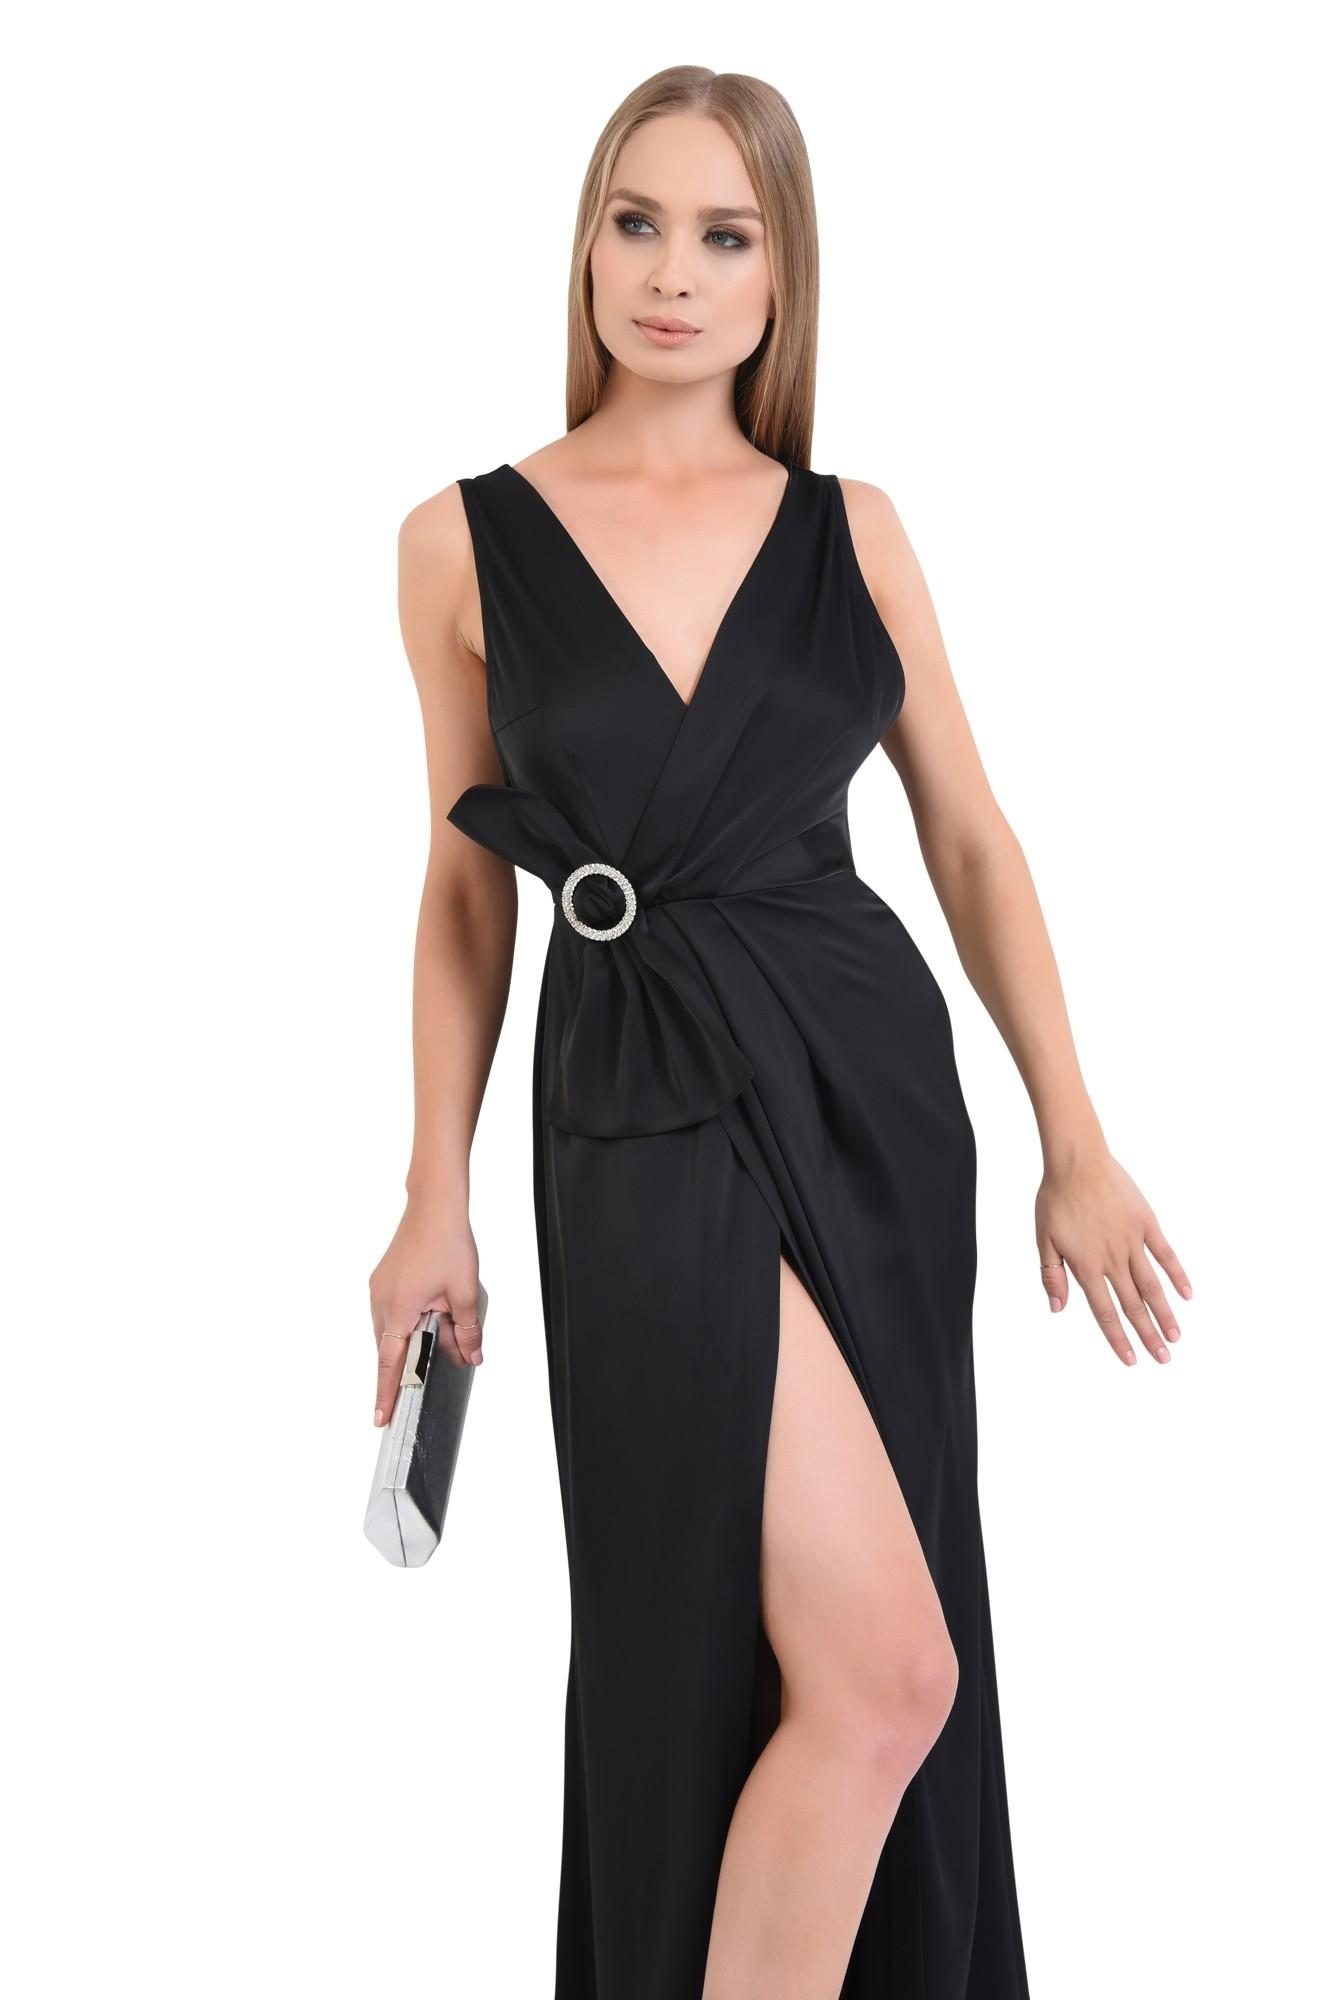 0 - rochie de seara, petrecuta, neagra, satin, cu funda, strasuri